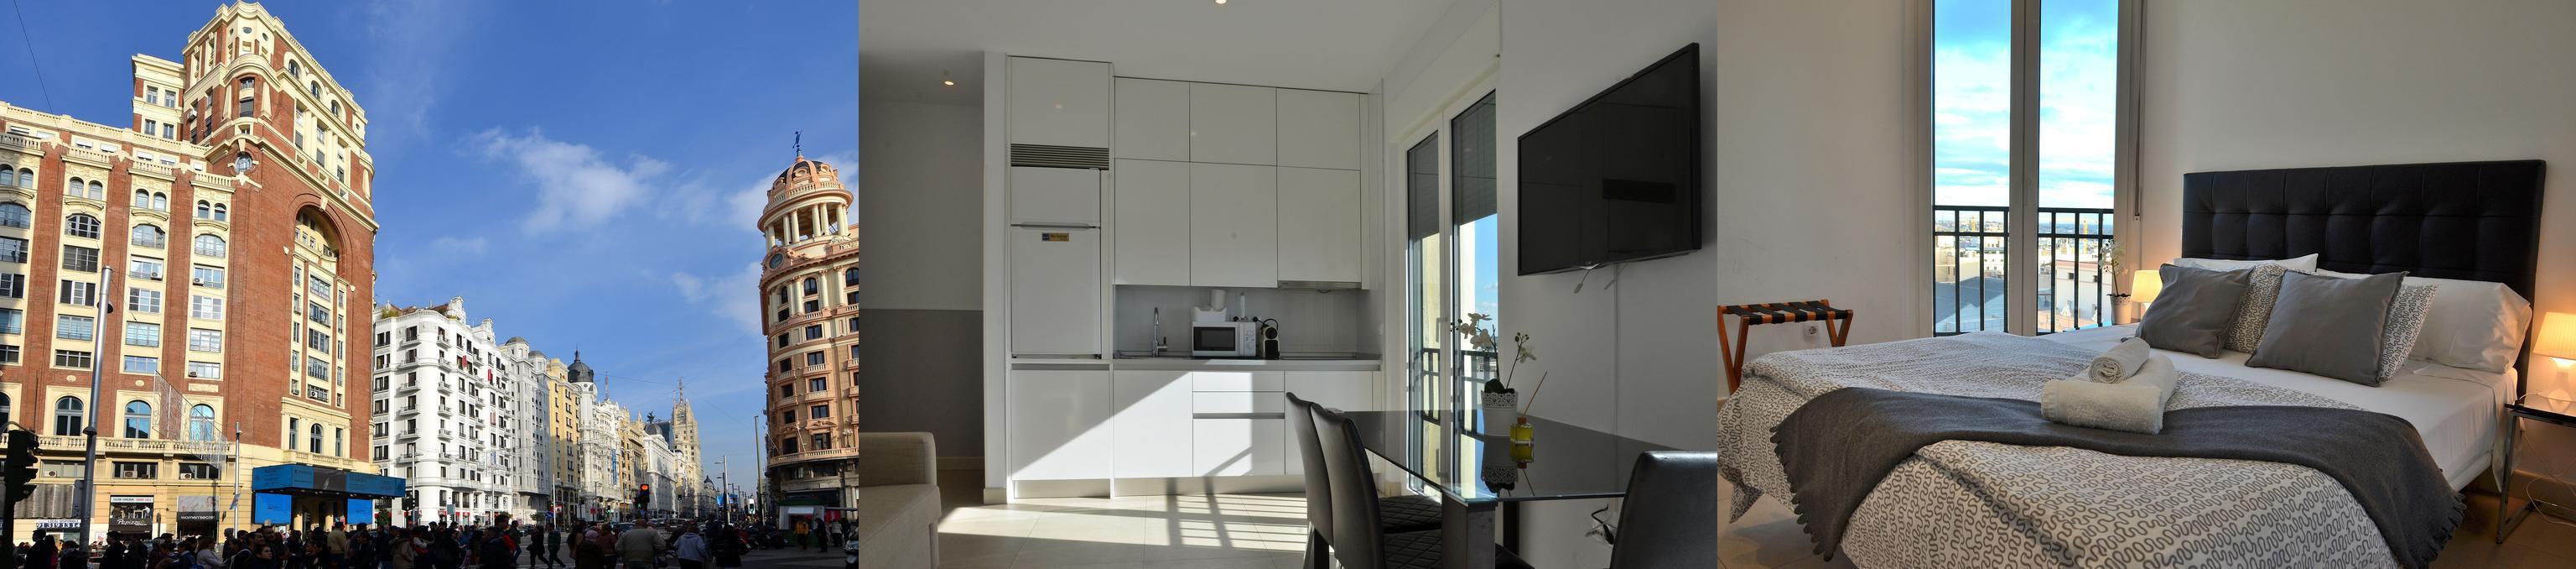 Dream Gran Vía 46 Apartments